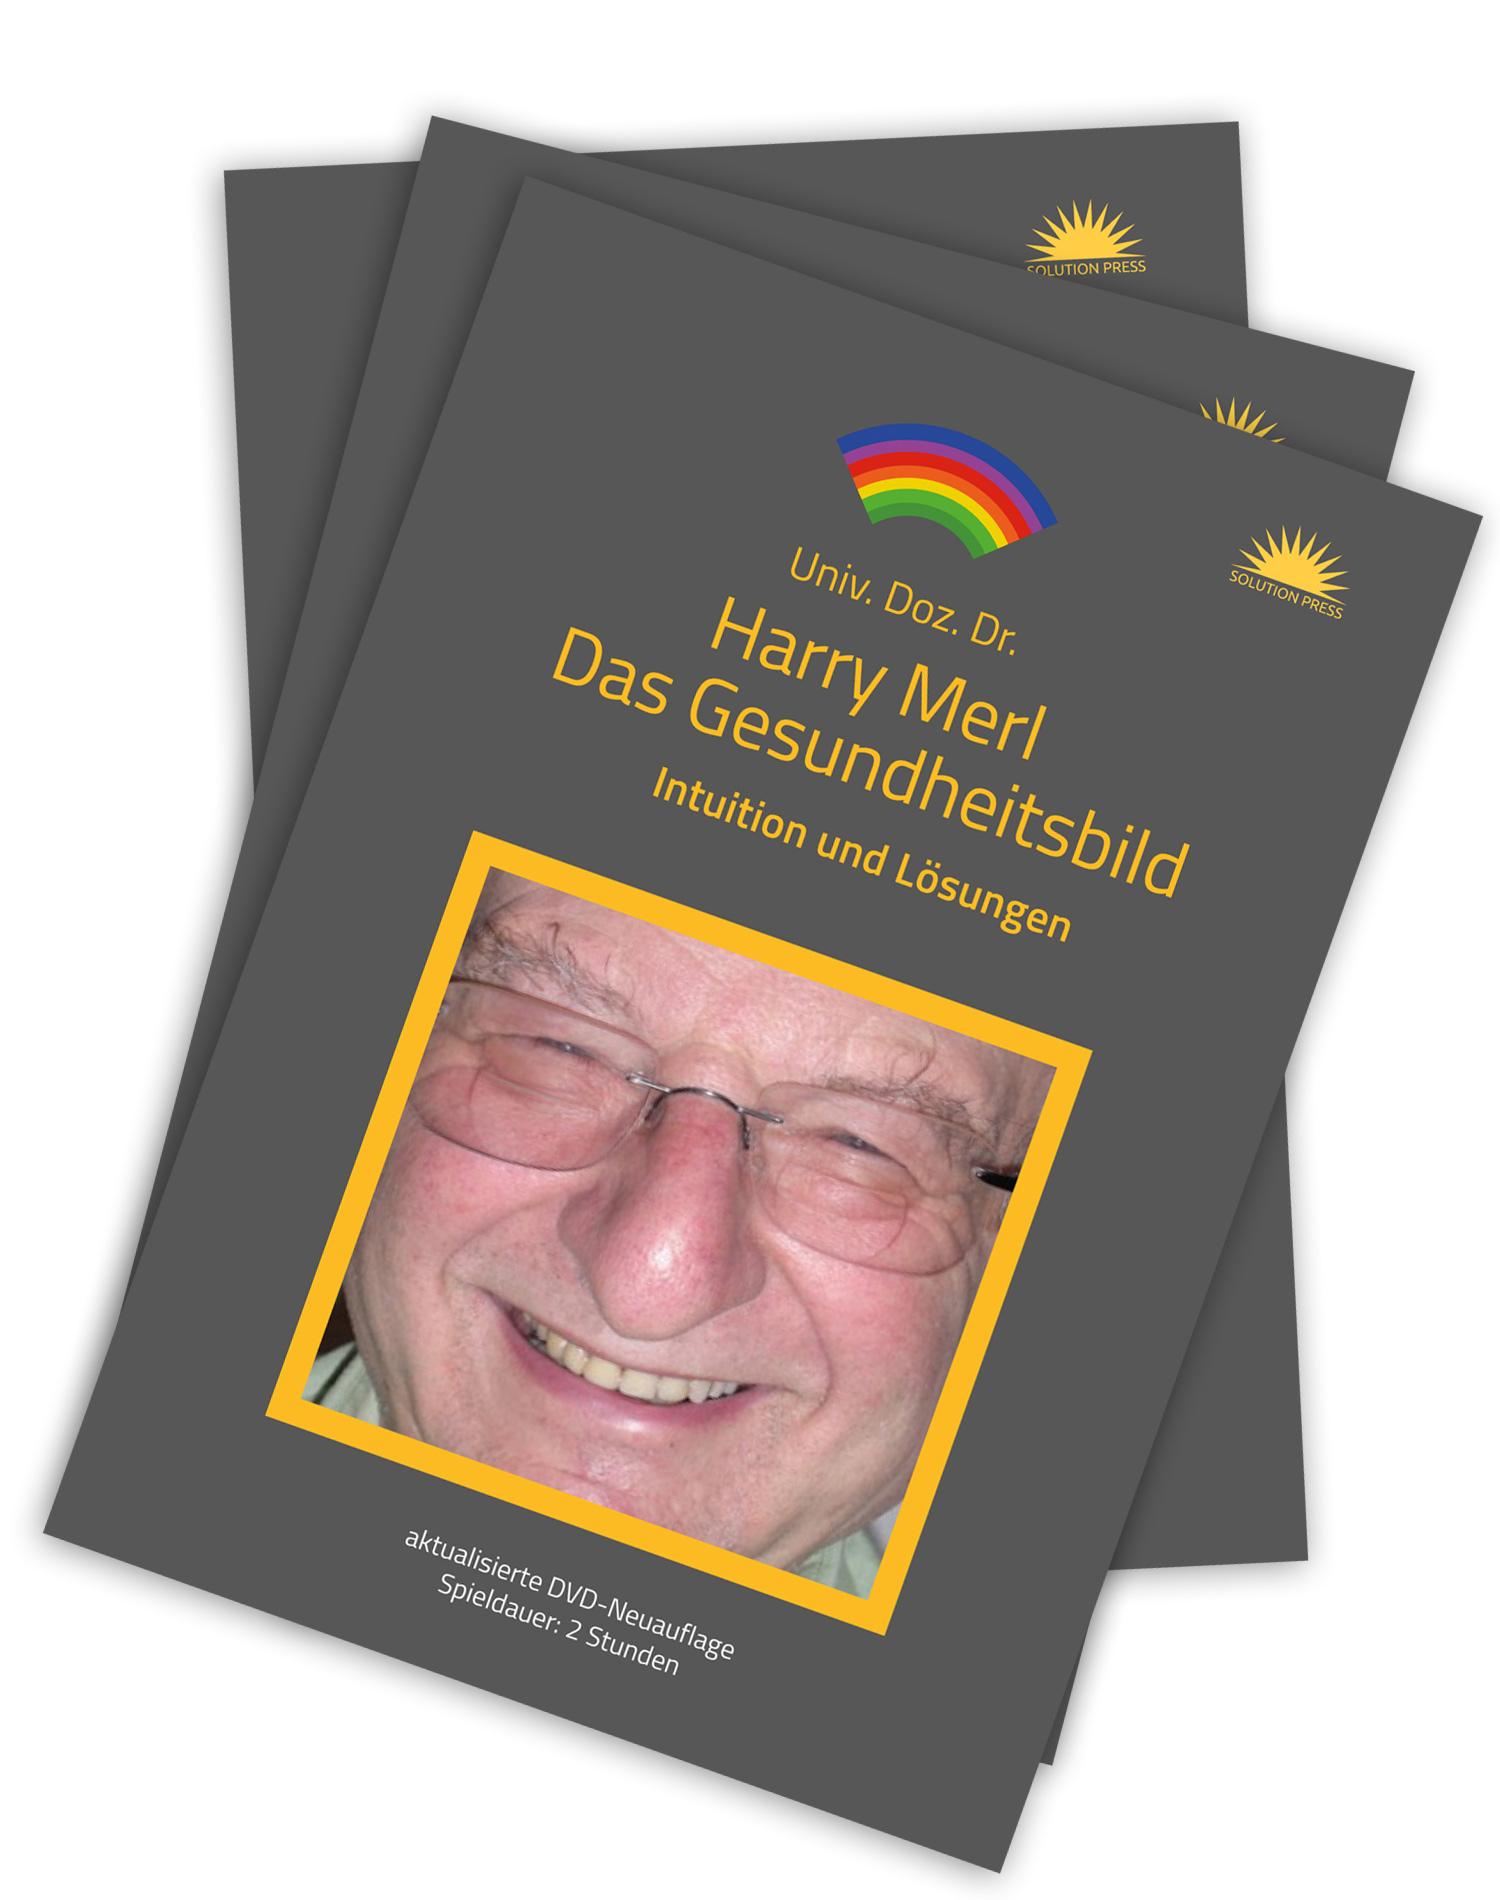 DVD Cover für Verlag Solutionpress